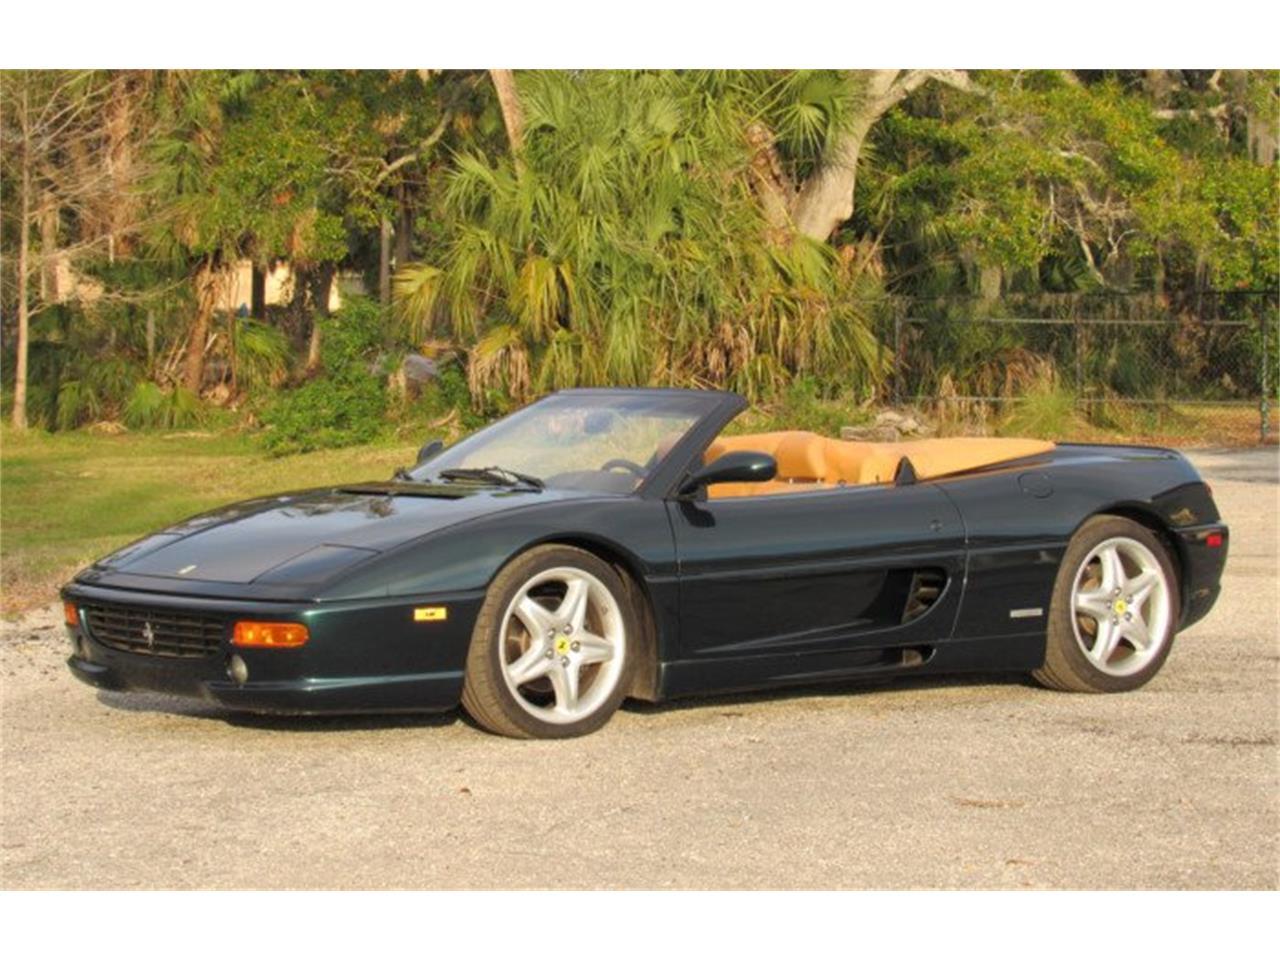 Large Picture of 1995 Ferrari F355 located in Punta Gorda Florida Auction Vehicle - PH0T